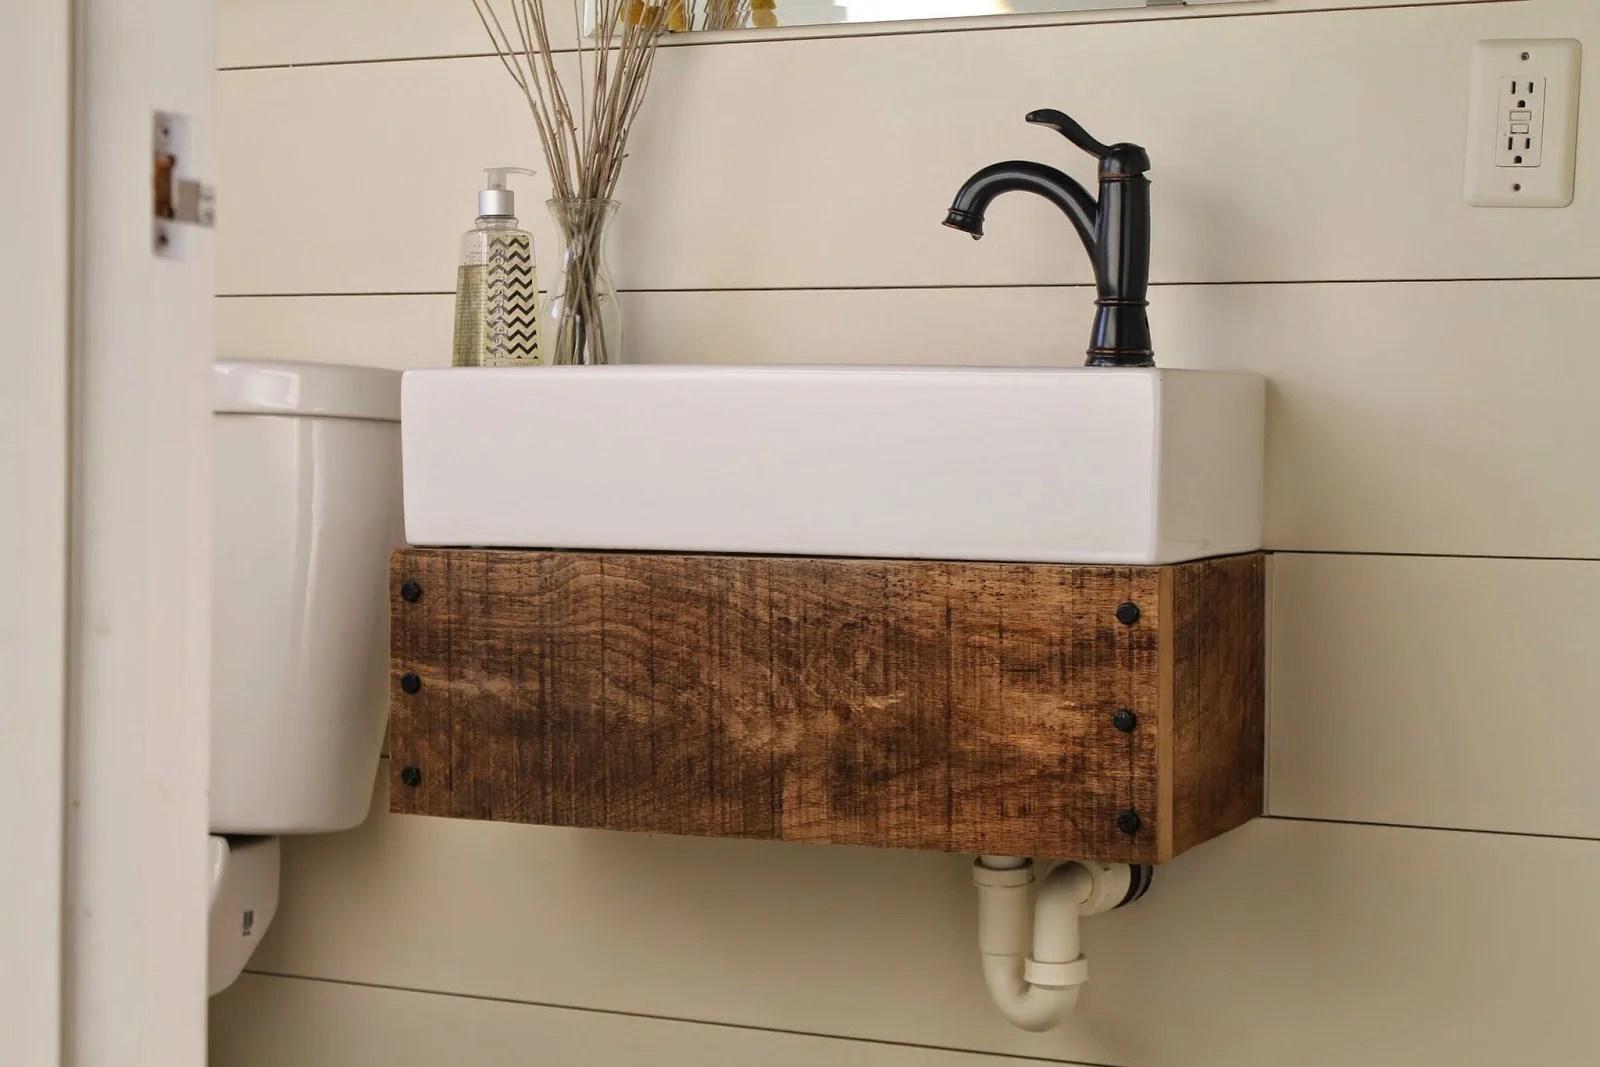 Best Kitchen Gallery: Remodelaholic Reclaimed Wood Floating Vanity of Floating Bathroom Vanities Ikea on rachelxblog.com